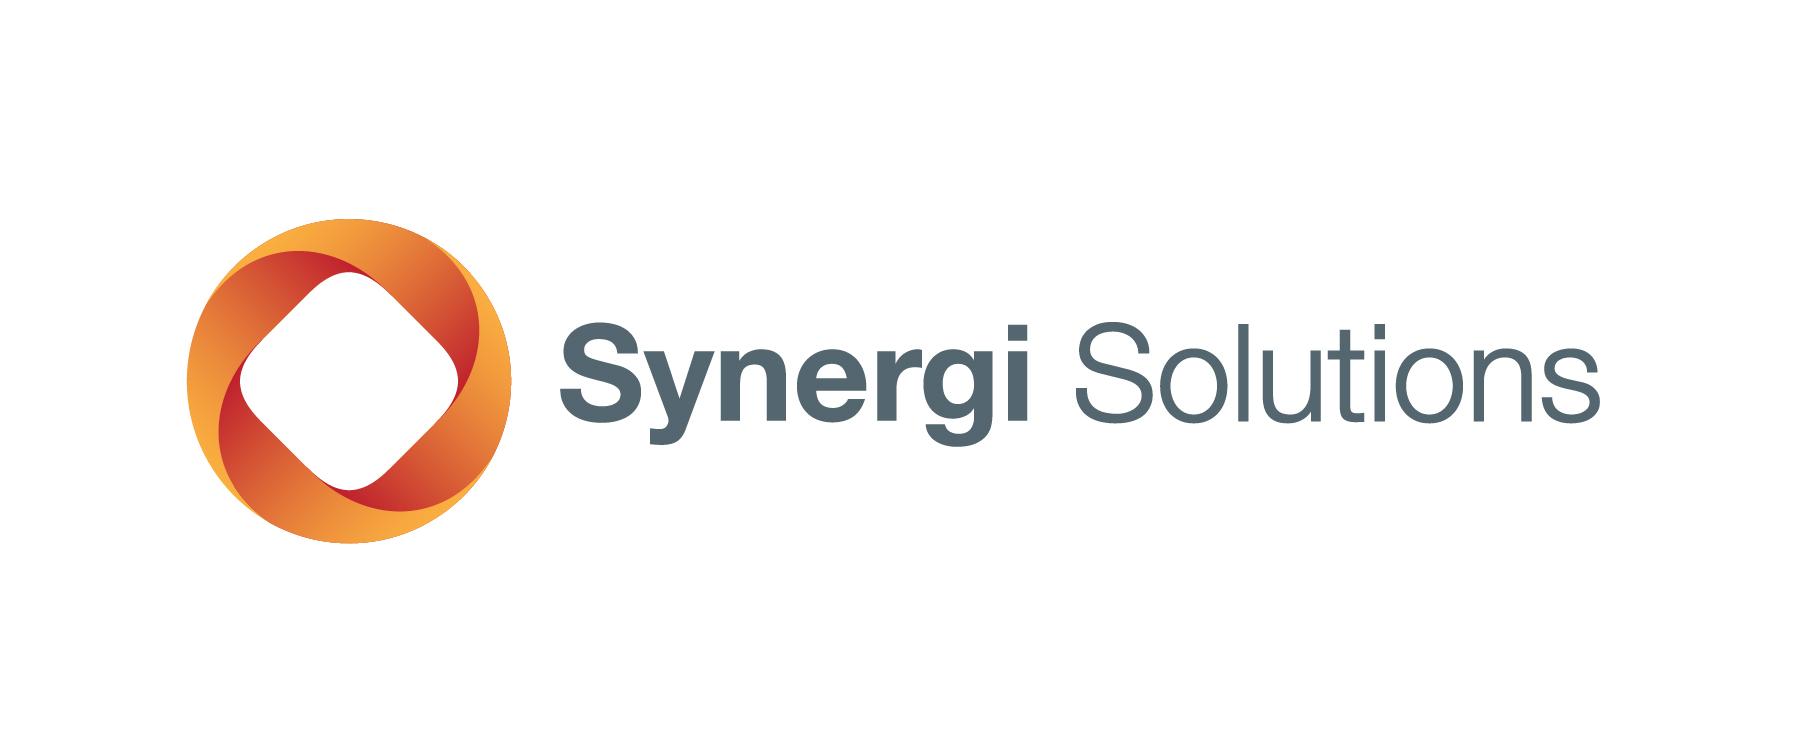 Synergi1new-01.jpg